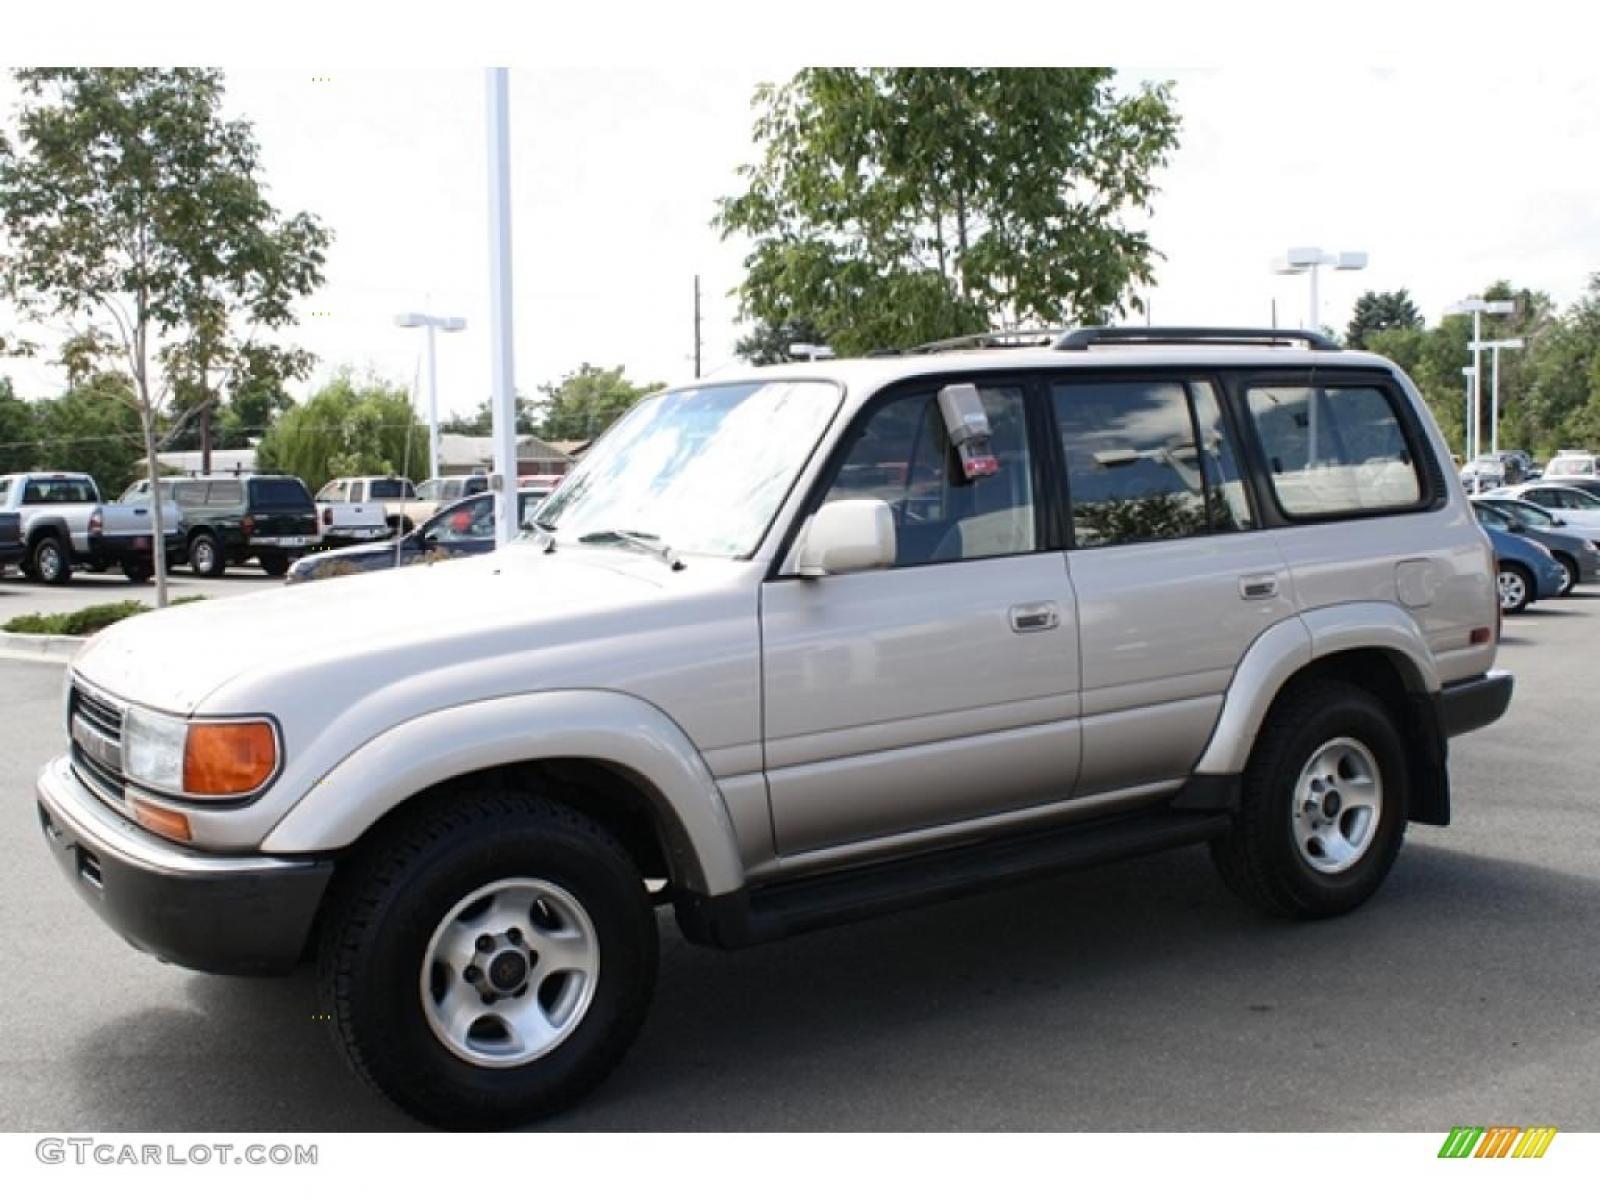 1993 Toyota Land Cruiser #10